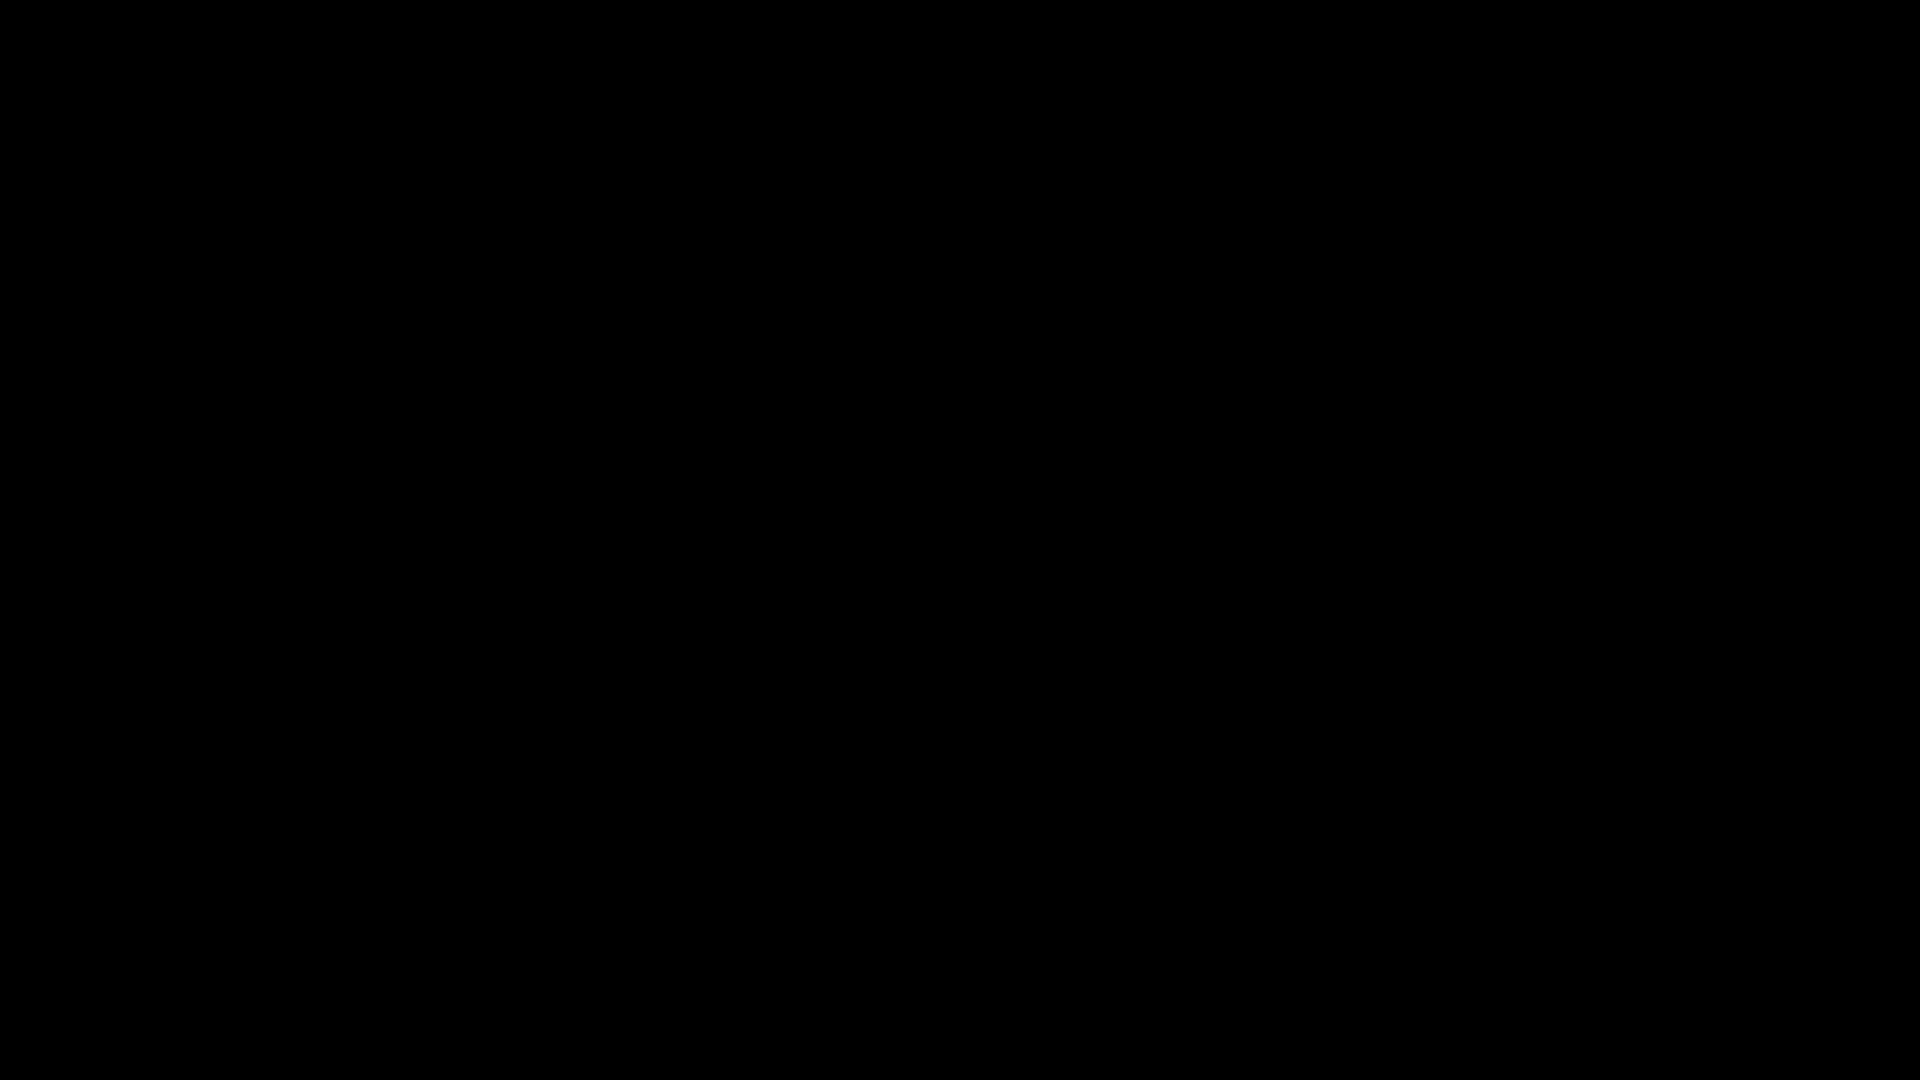 bullethell, gaming, roguelegacy, svp13_RL_1 GIFs